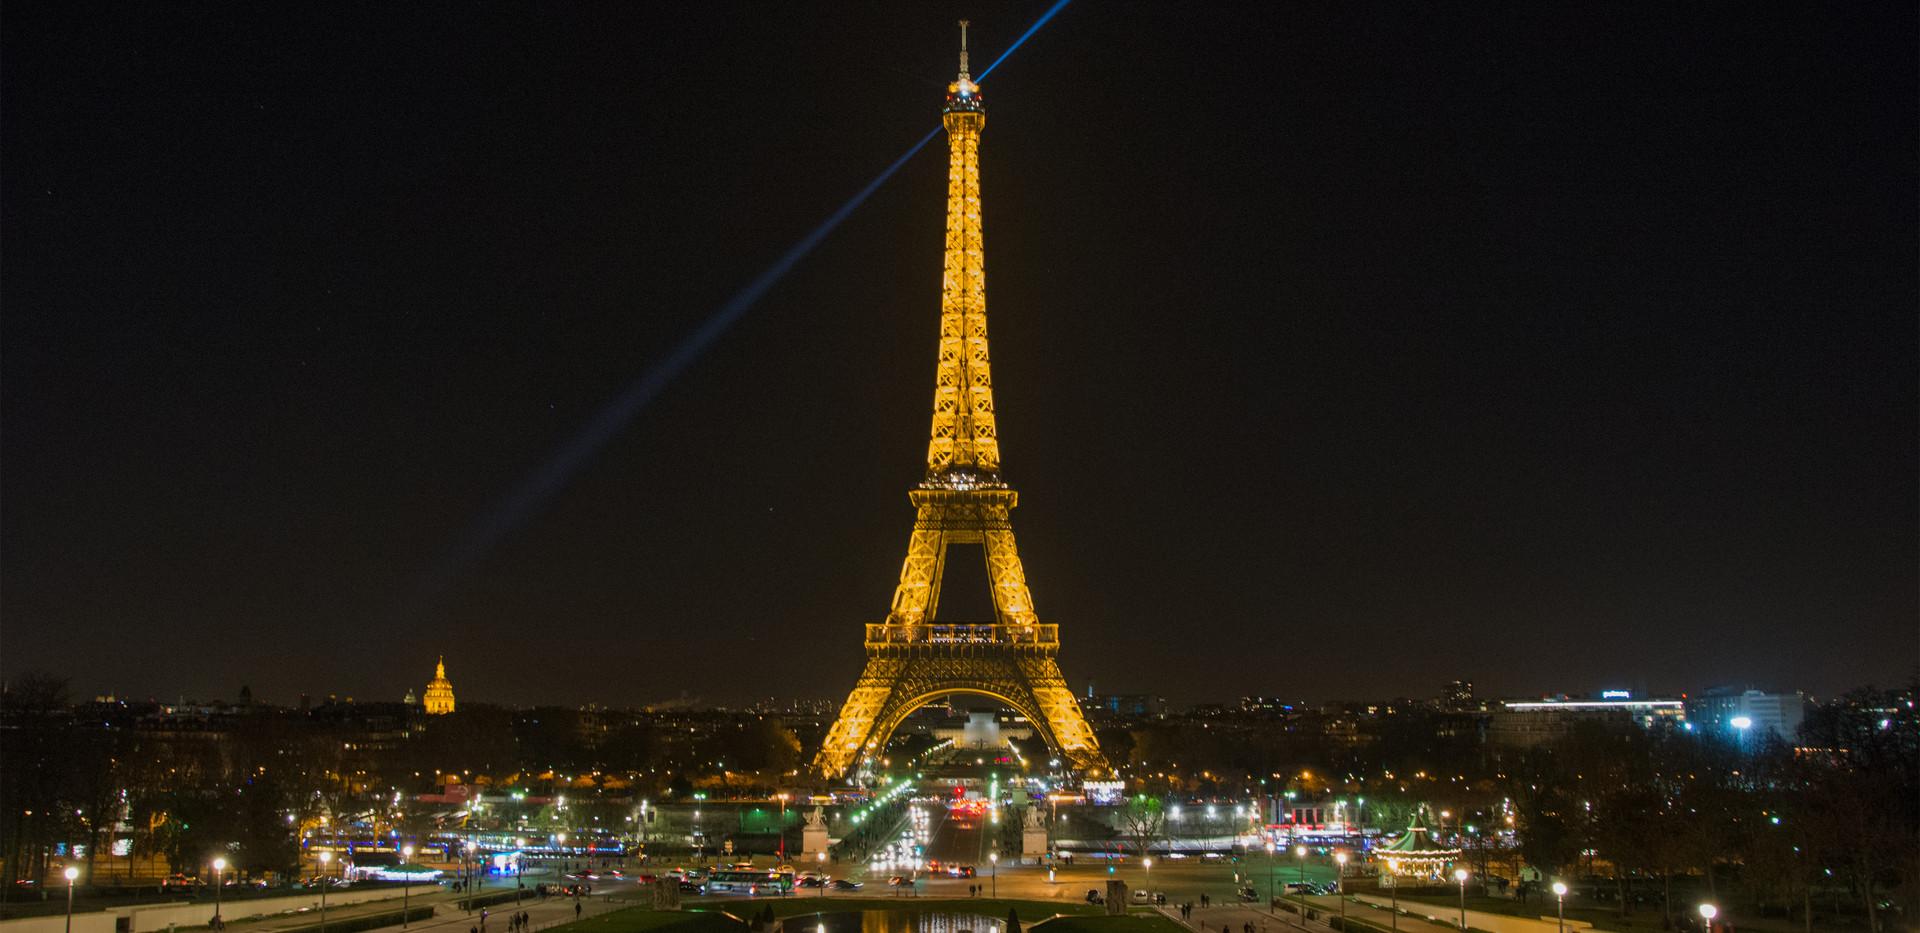 Eifel-Tower-Night-1.jpg